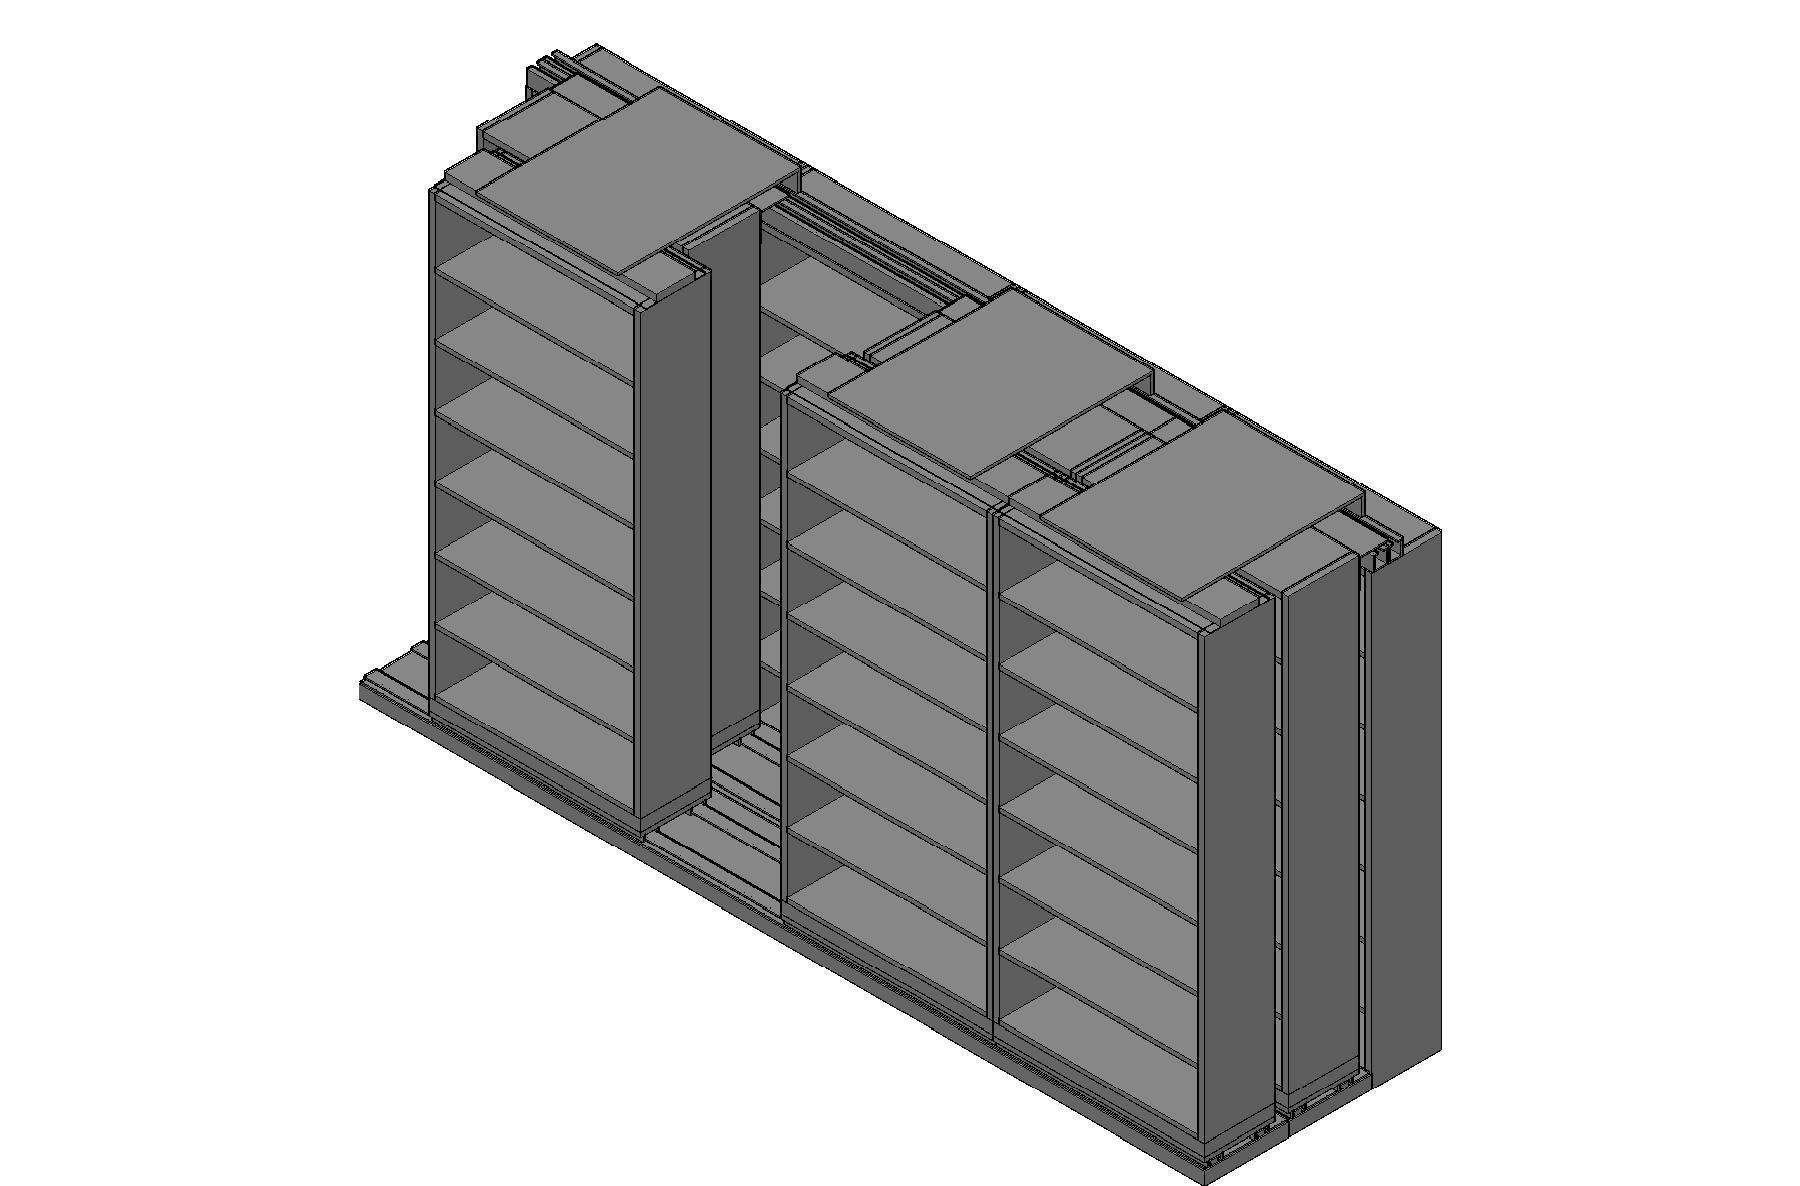 "Letter Size Sliding Shelves - 3 Rows Deep - 7 Levels - (36"" x 12"" Shelves) - 148"" Total Width"